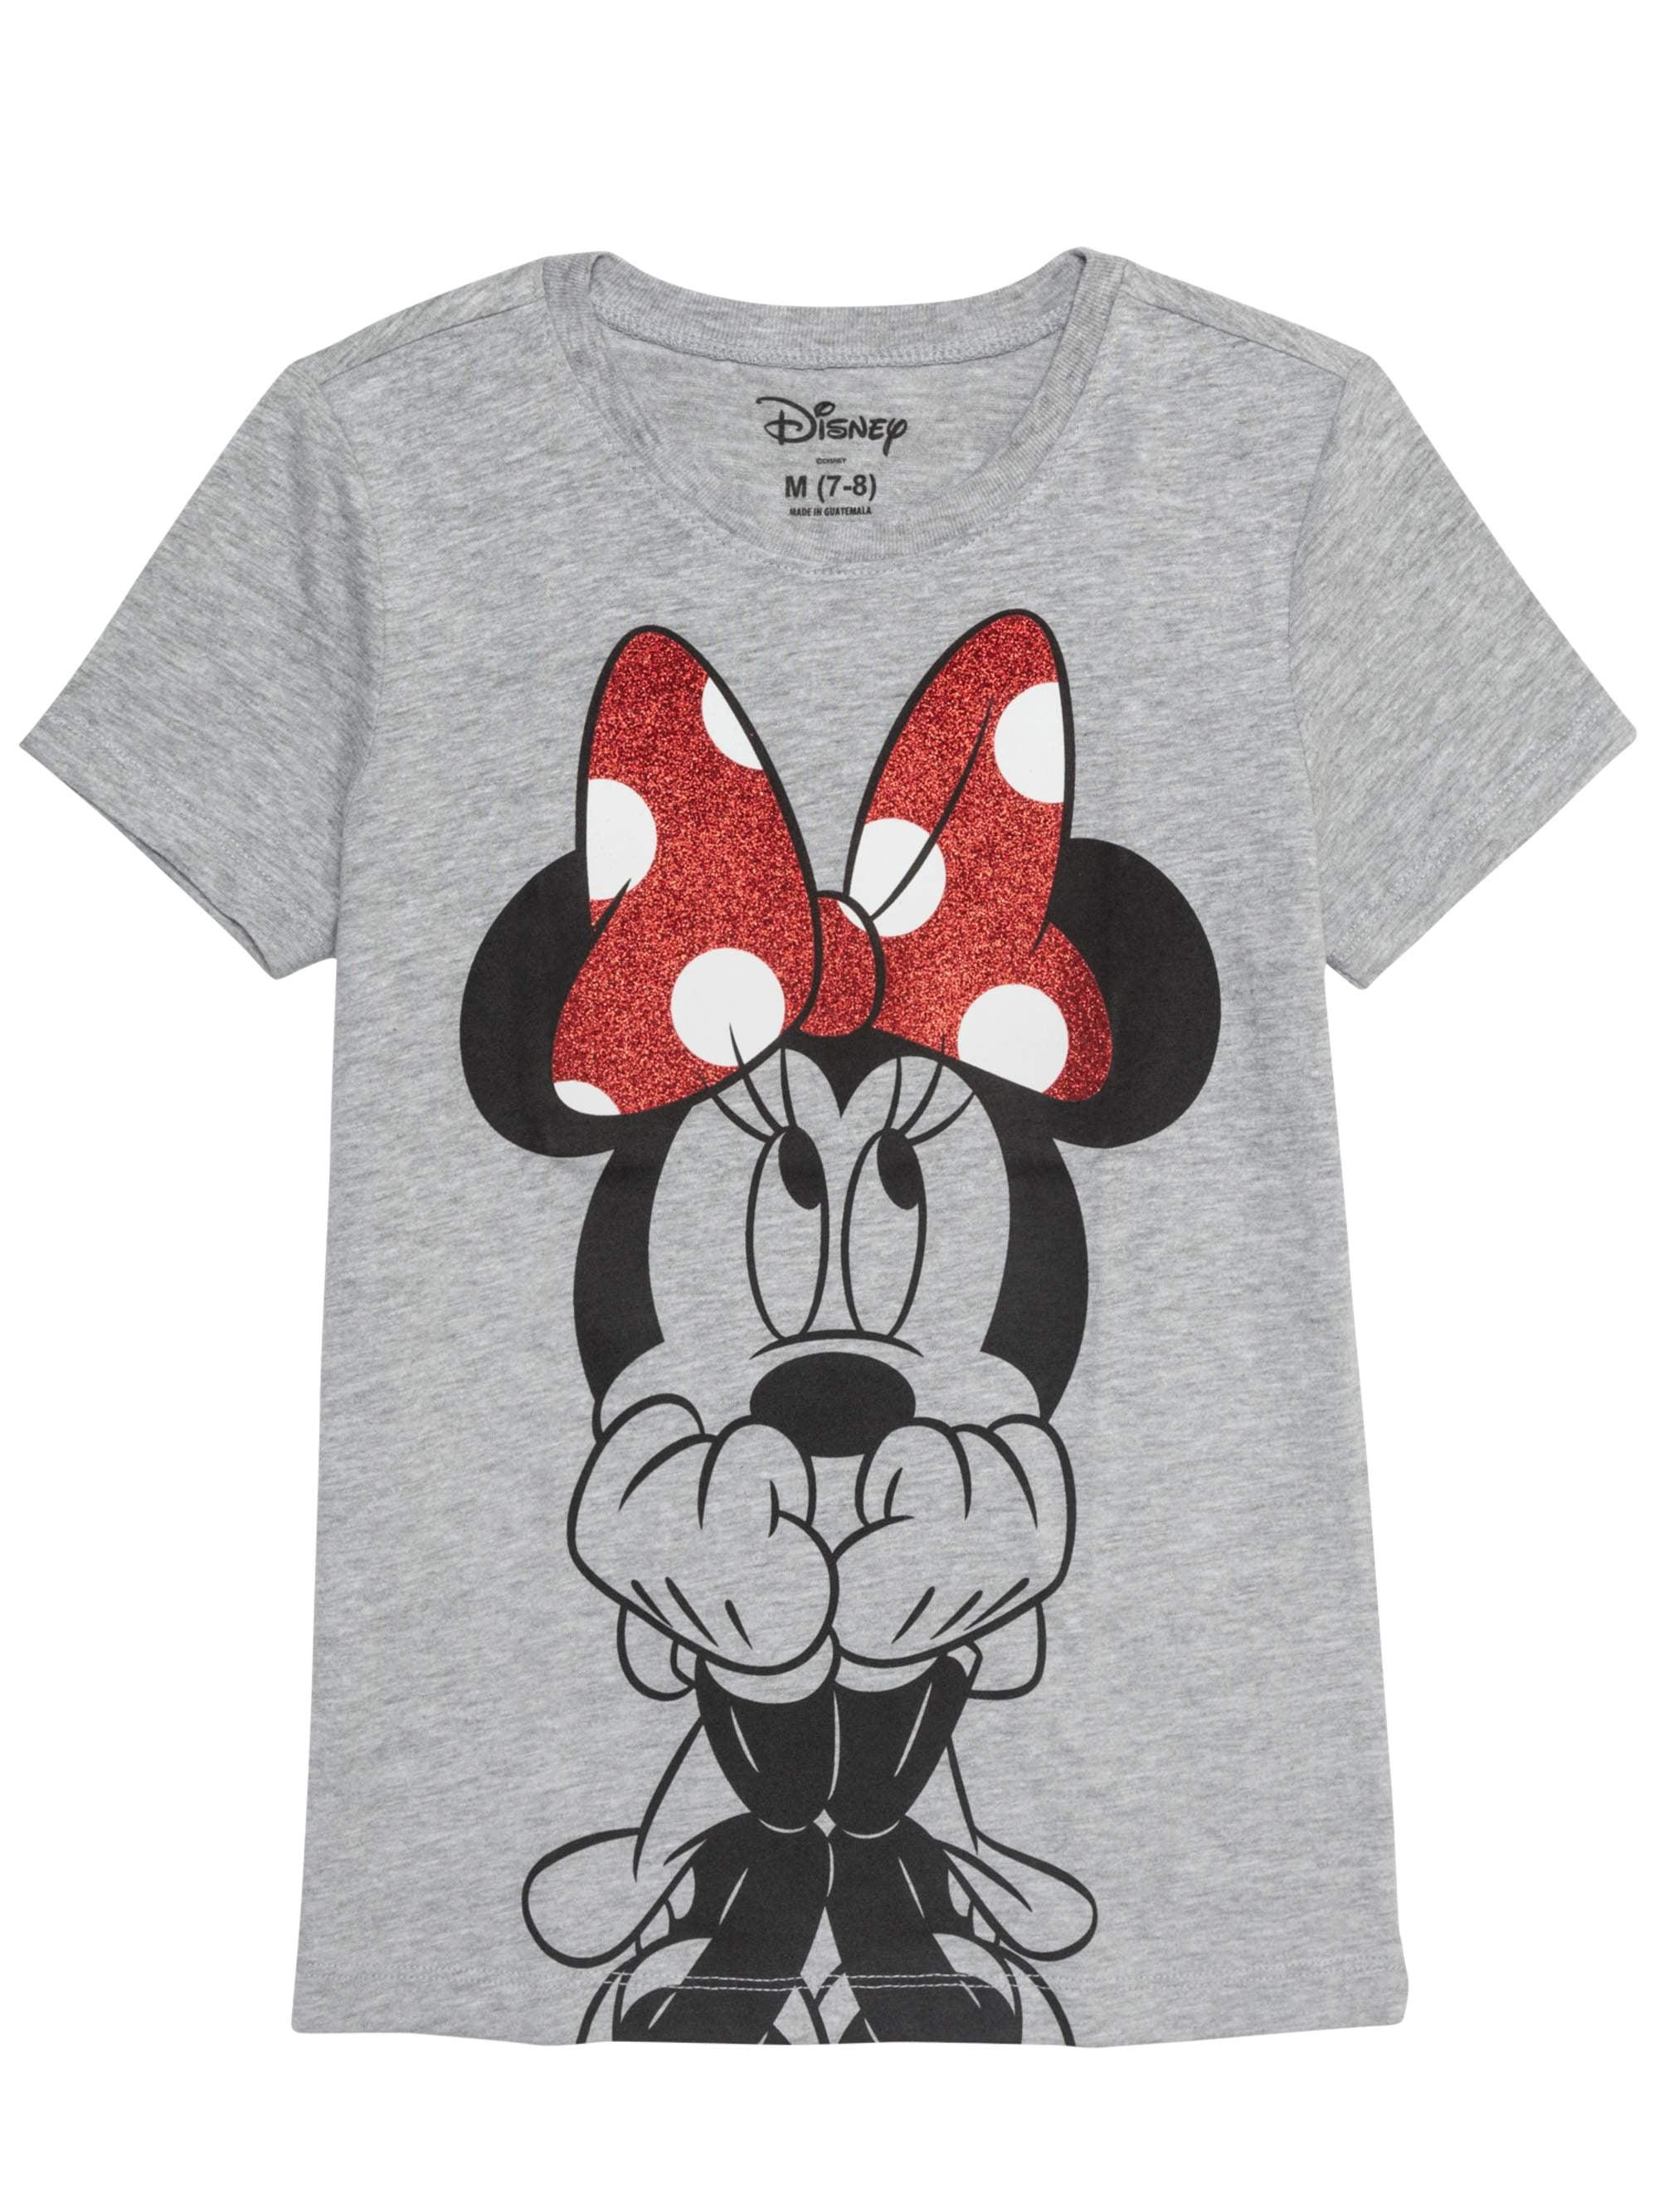 10-12 Disney Minnie Mouse Big Girls Legendary T-Shirt Gray